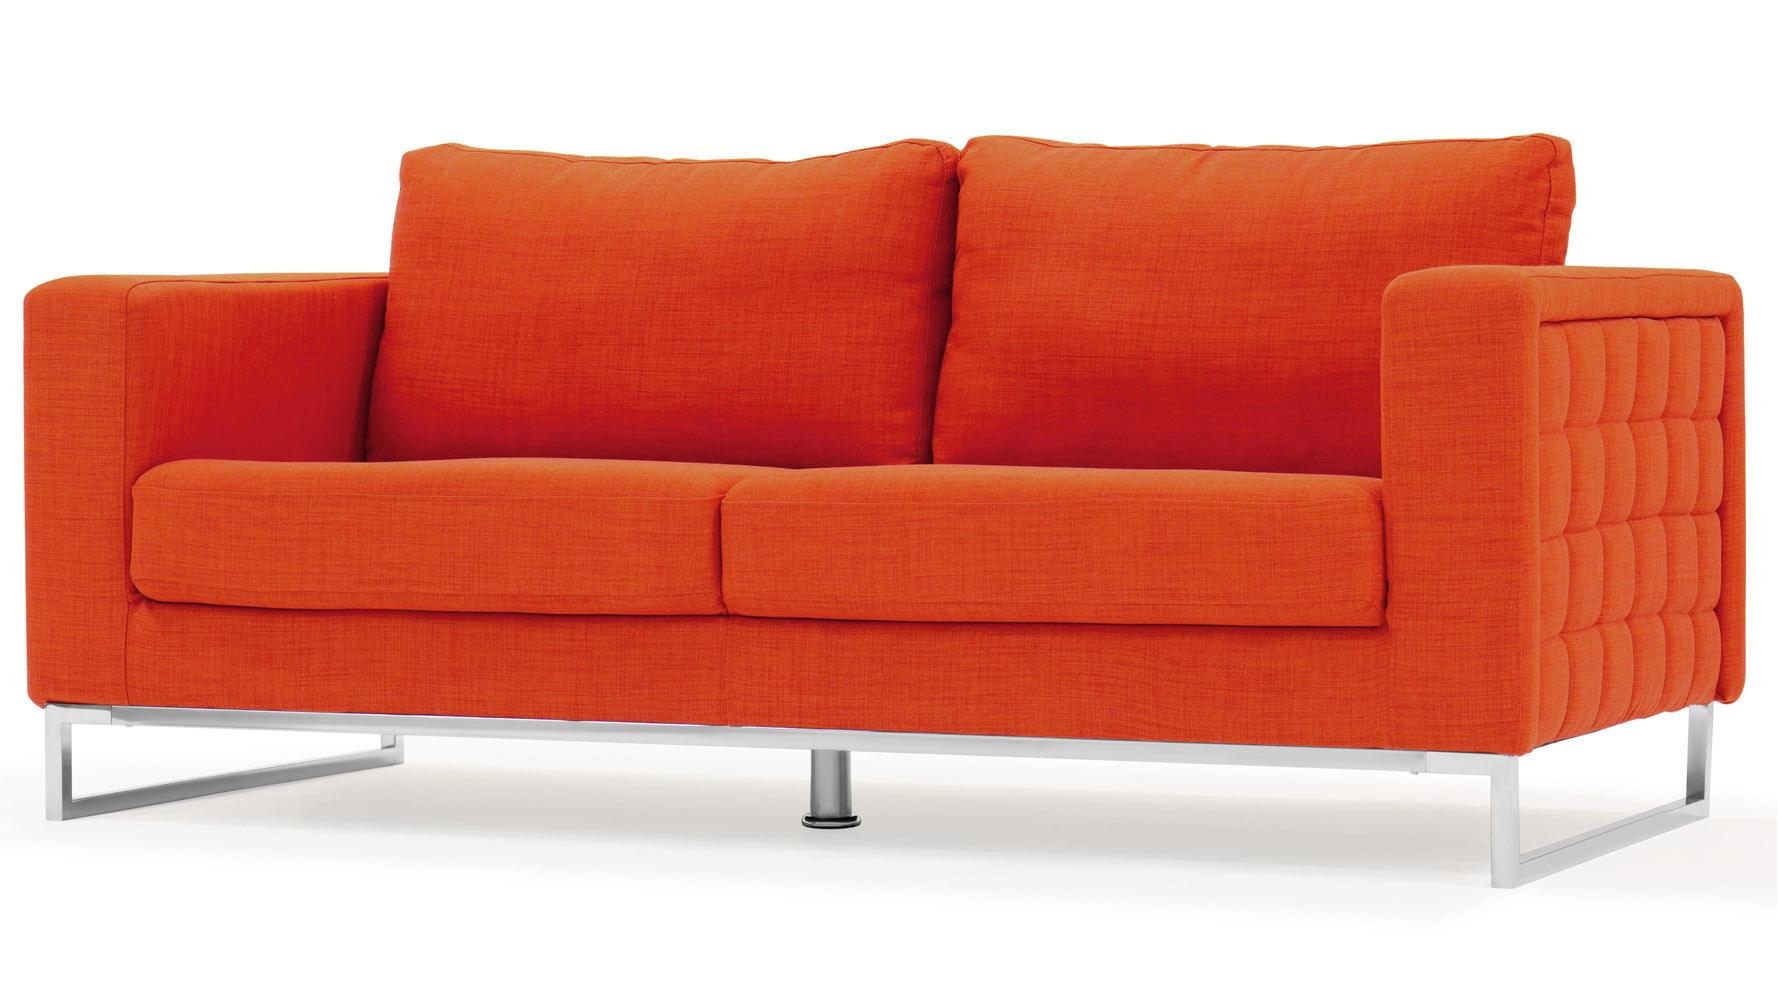 steel sofa set online chennai white leather mid century modern orange fabric upholstered 2 piece with